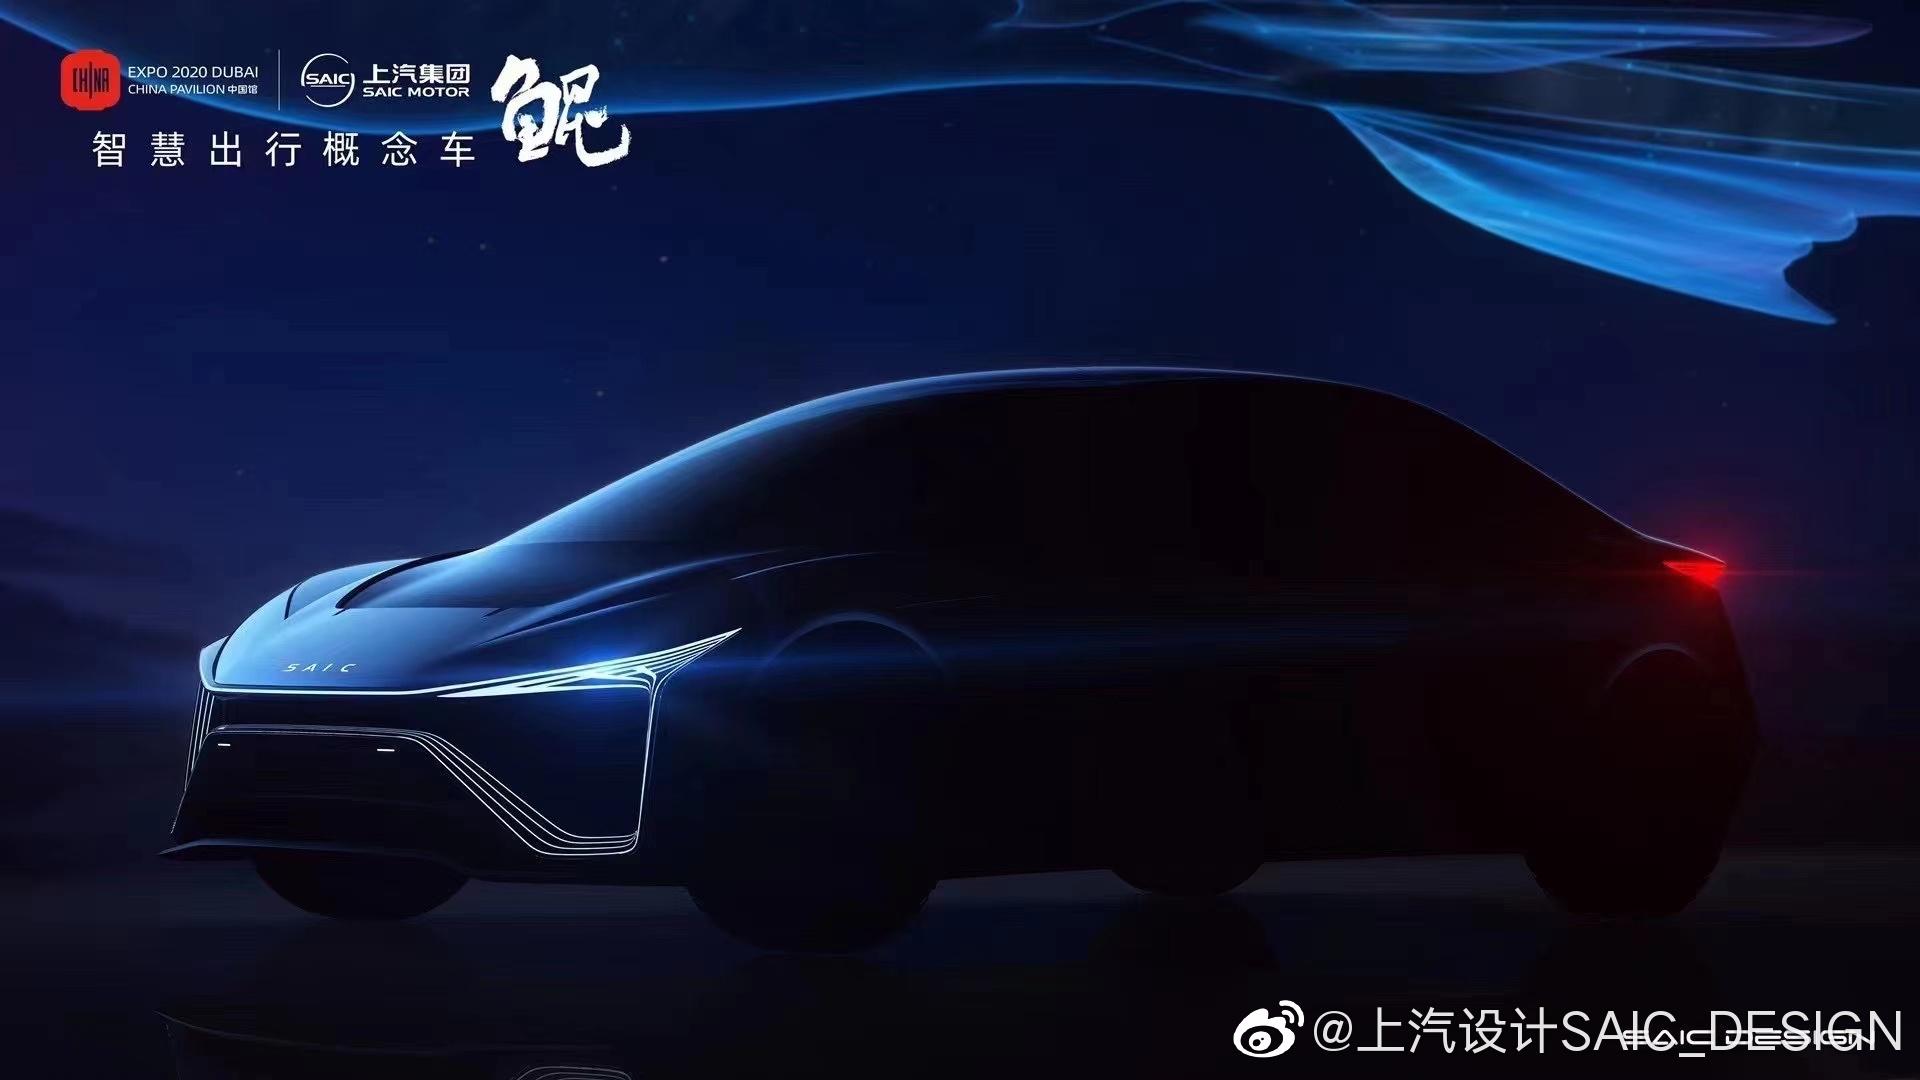 SAIC to debut concept car 'Kun' at Expo Dubai-CnEVPost